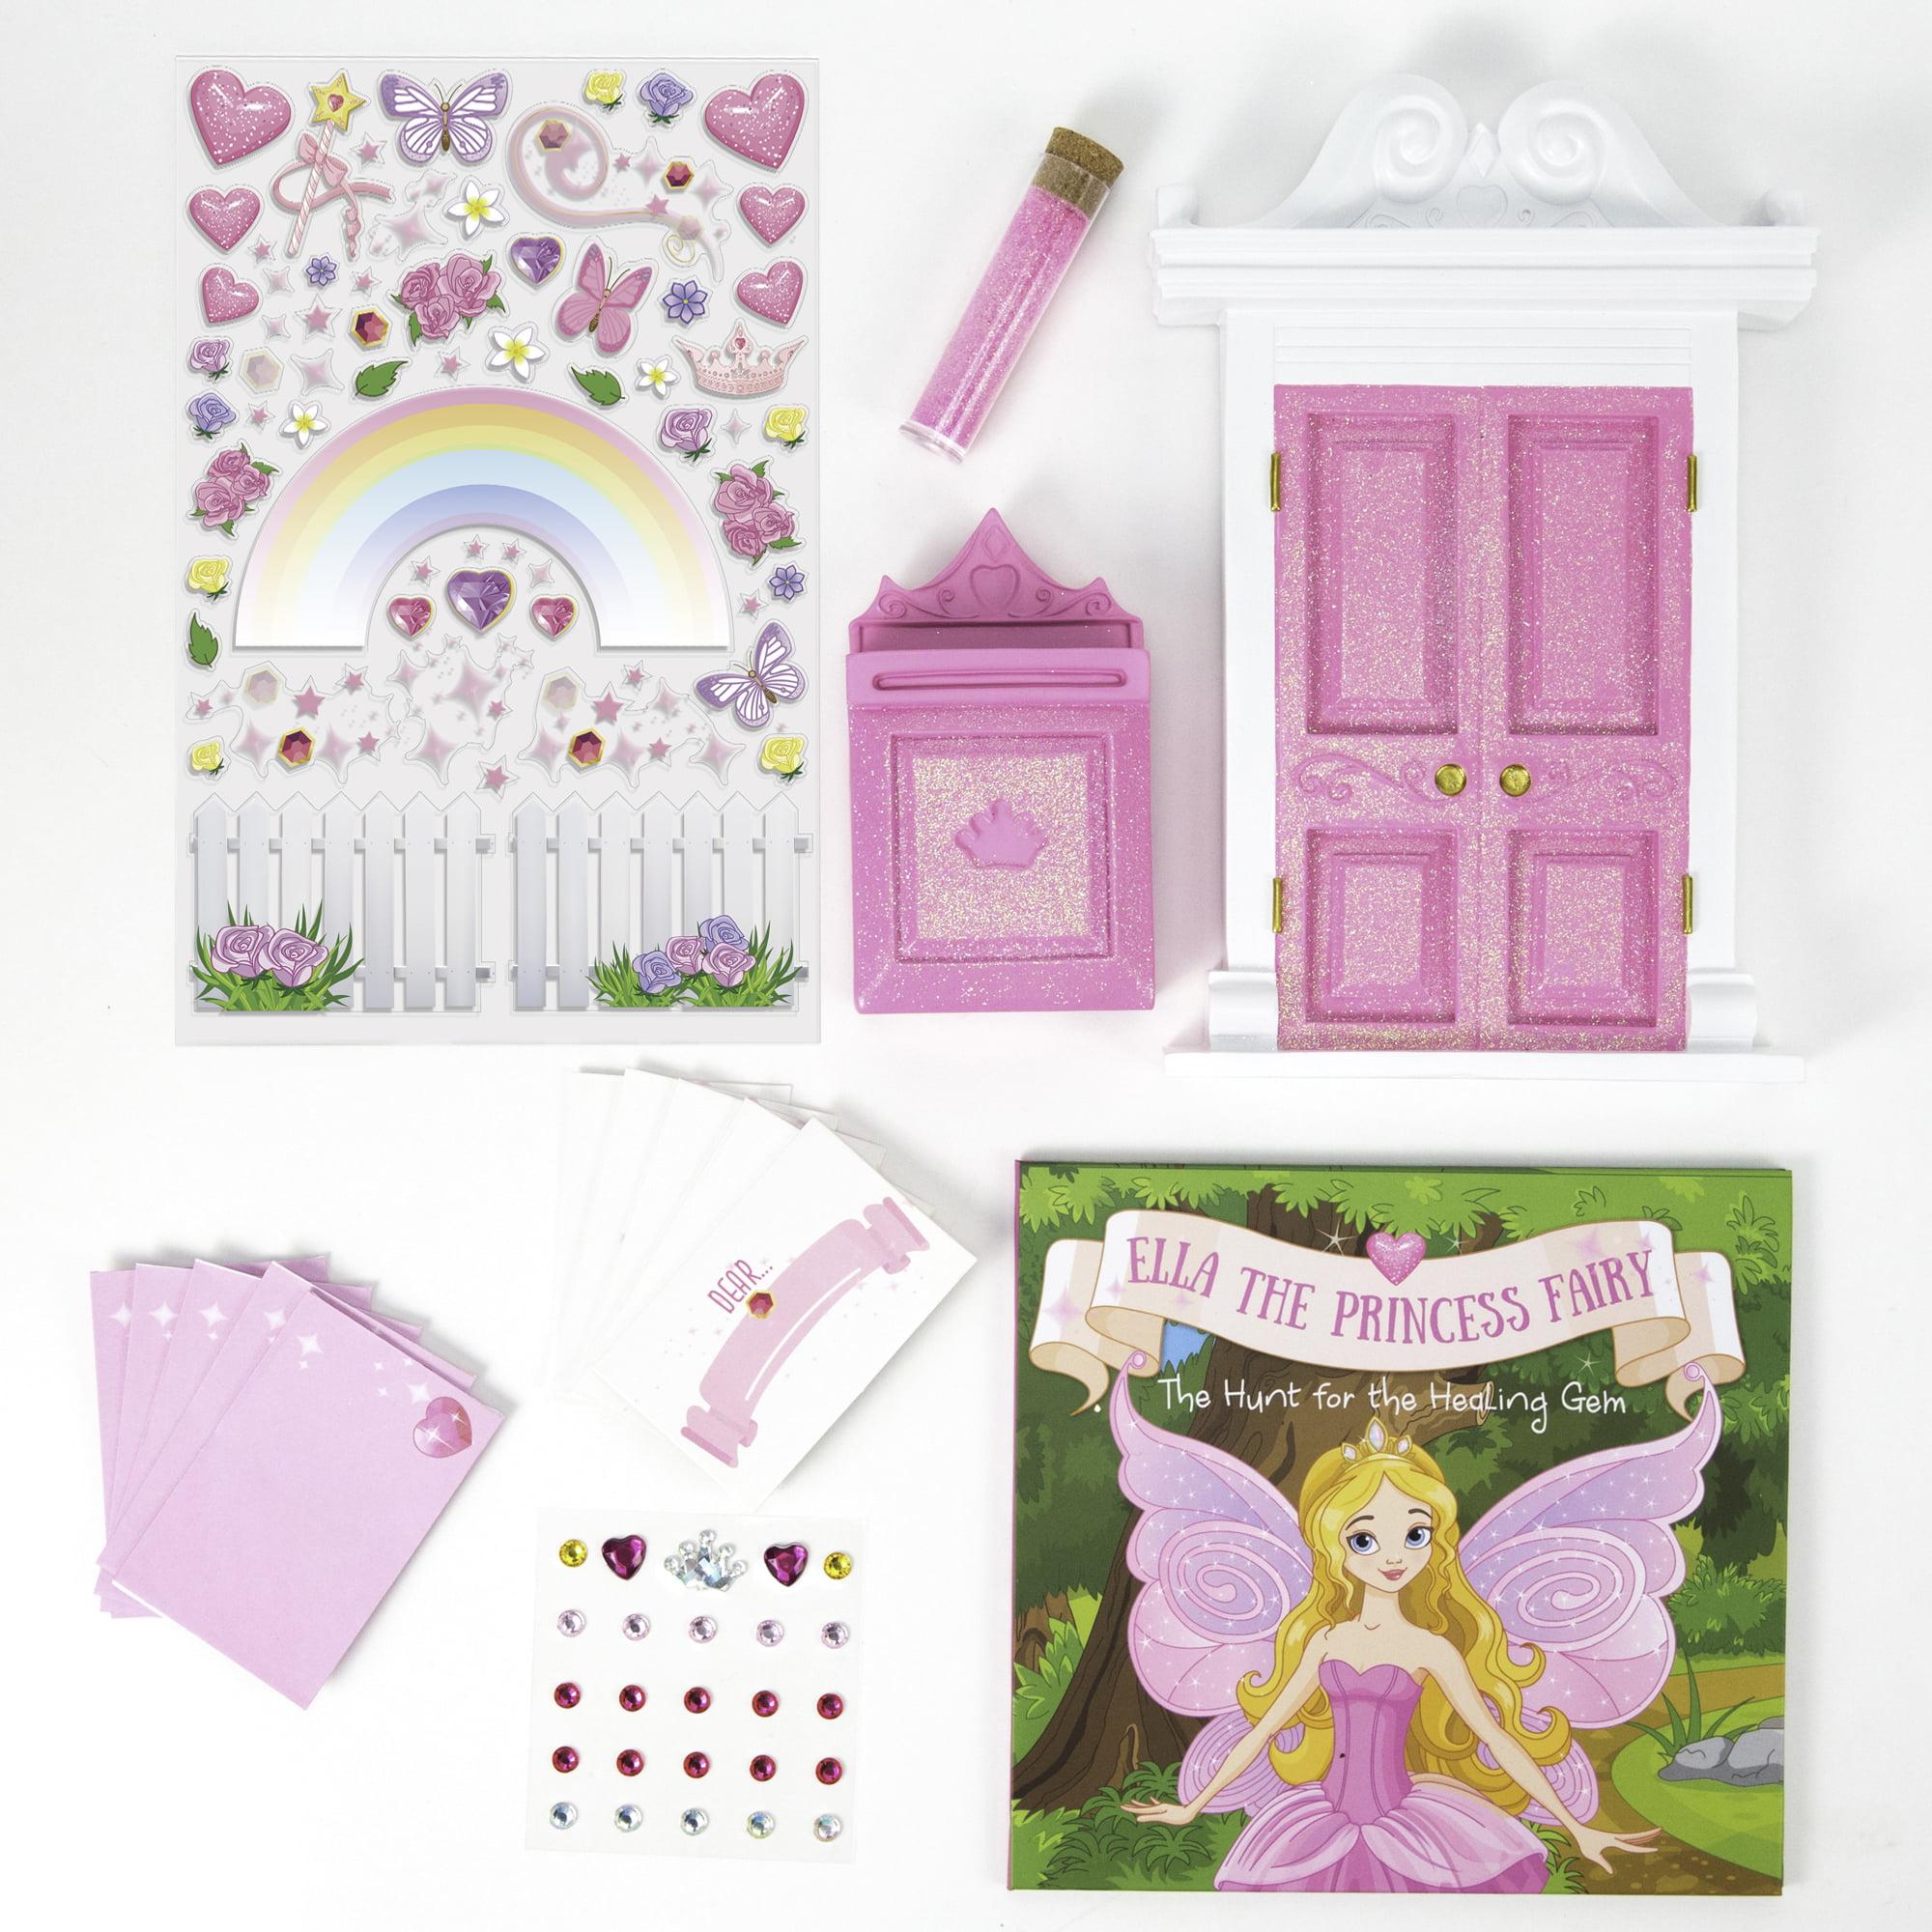 My Fairy Doorways Princess Fairy Door by Horizon Group USA - Walmart.com  sc 1 st  Walmart & My Fairy Doorways Princess Fairy Door by Horizon Group USA ... pezcame.com